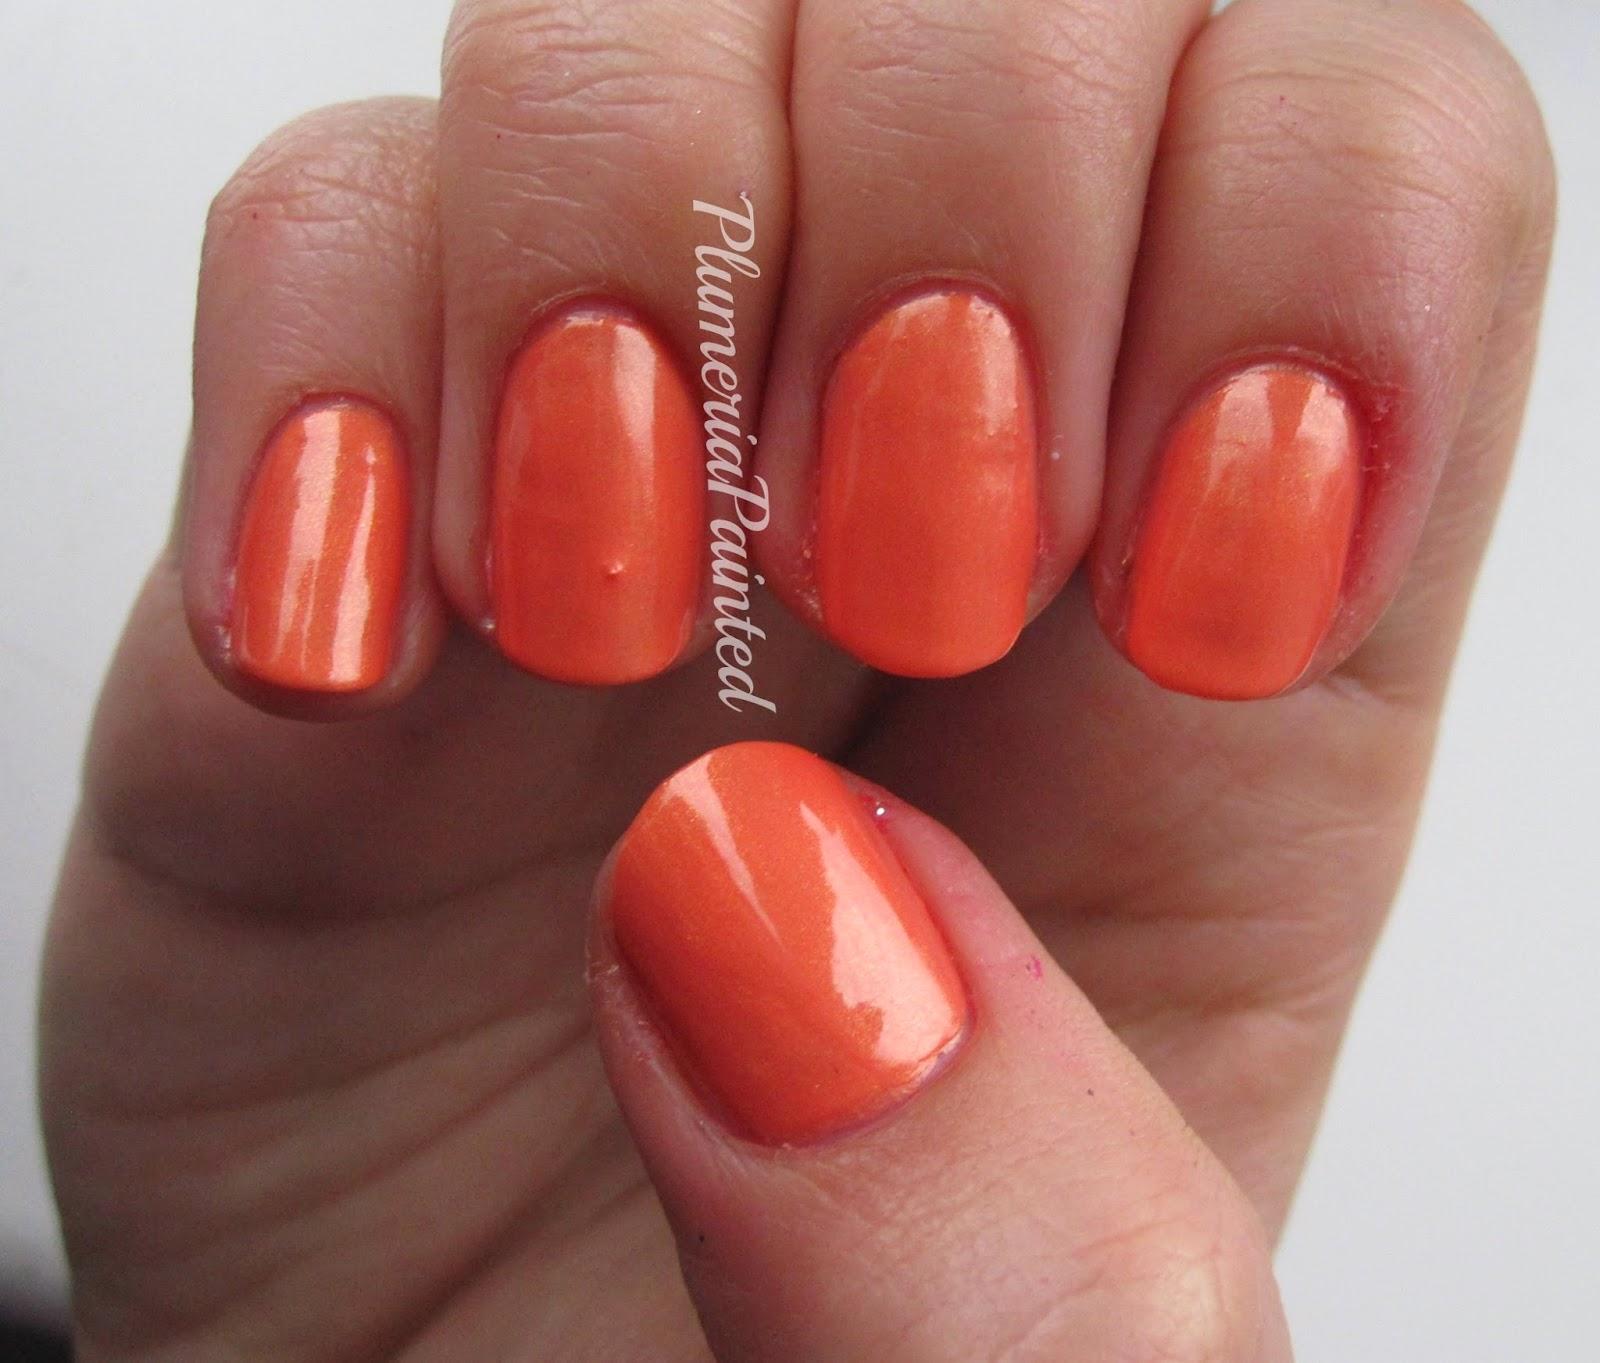 PlumeriaPainted: Orange Nails: Chilli Pepper - Orange (no name)